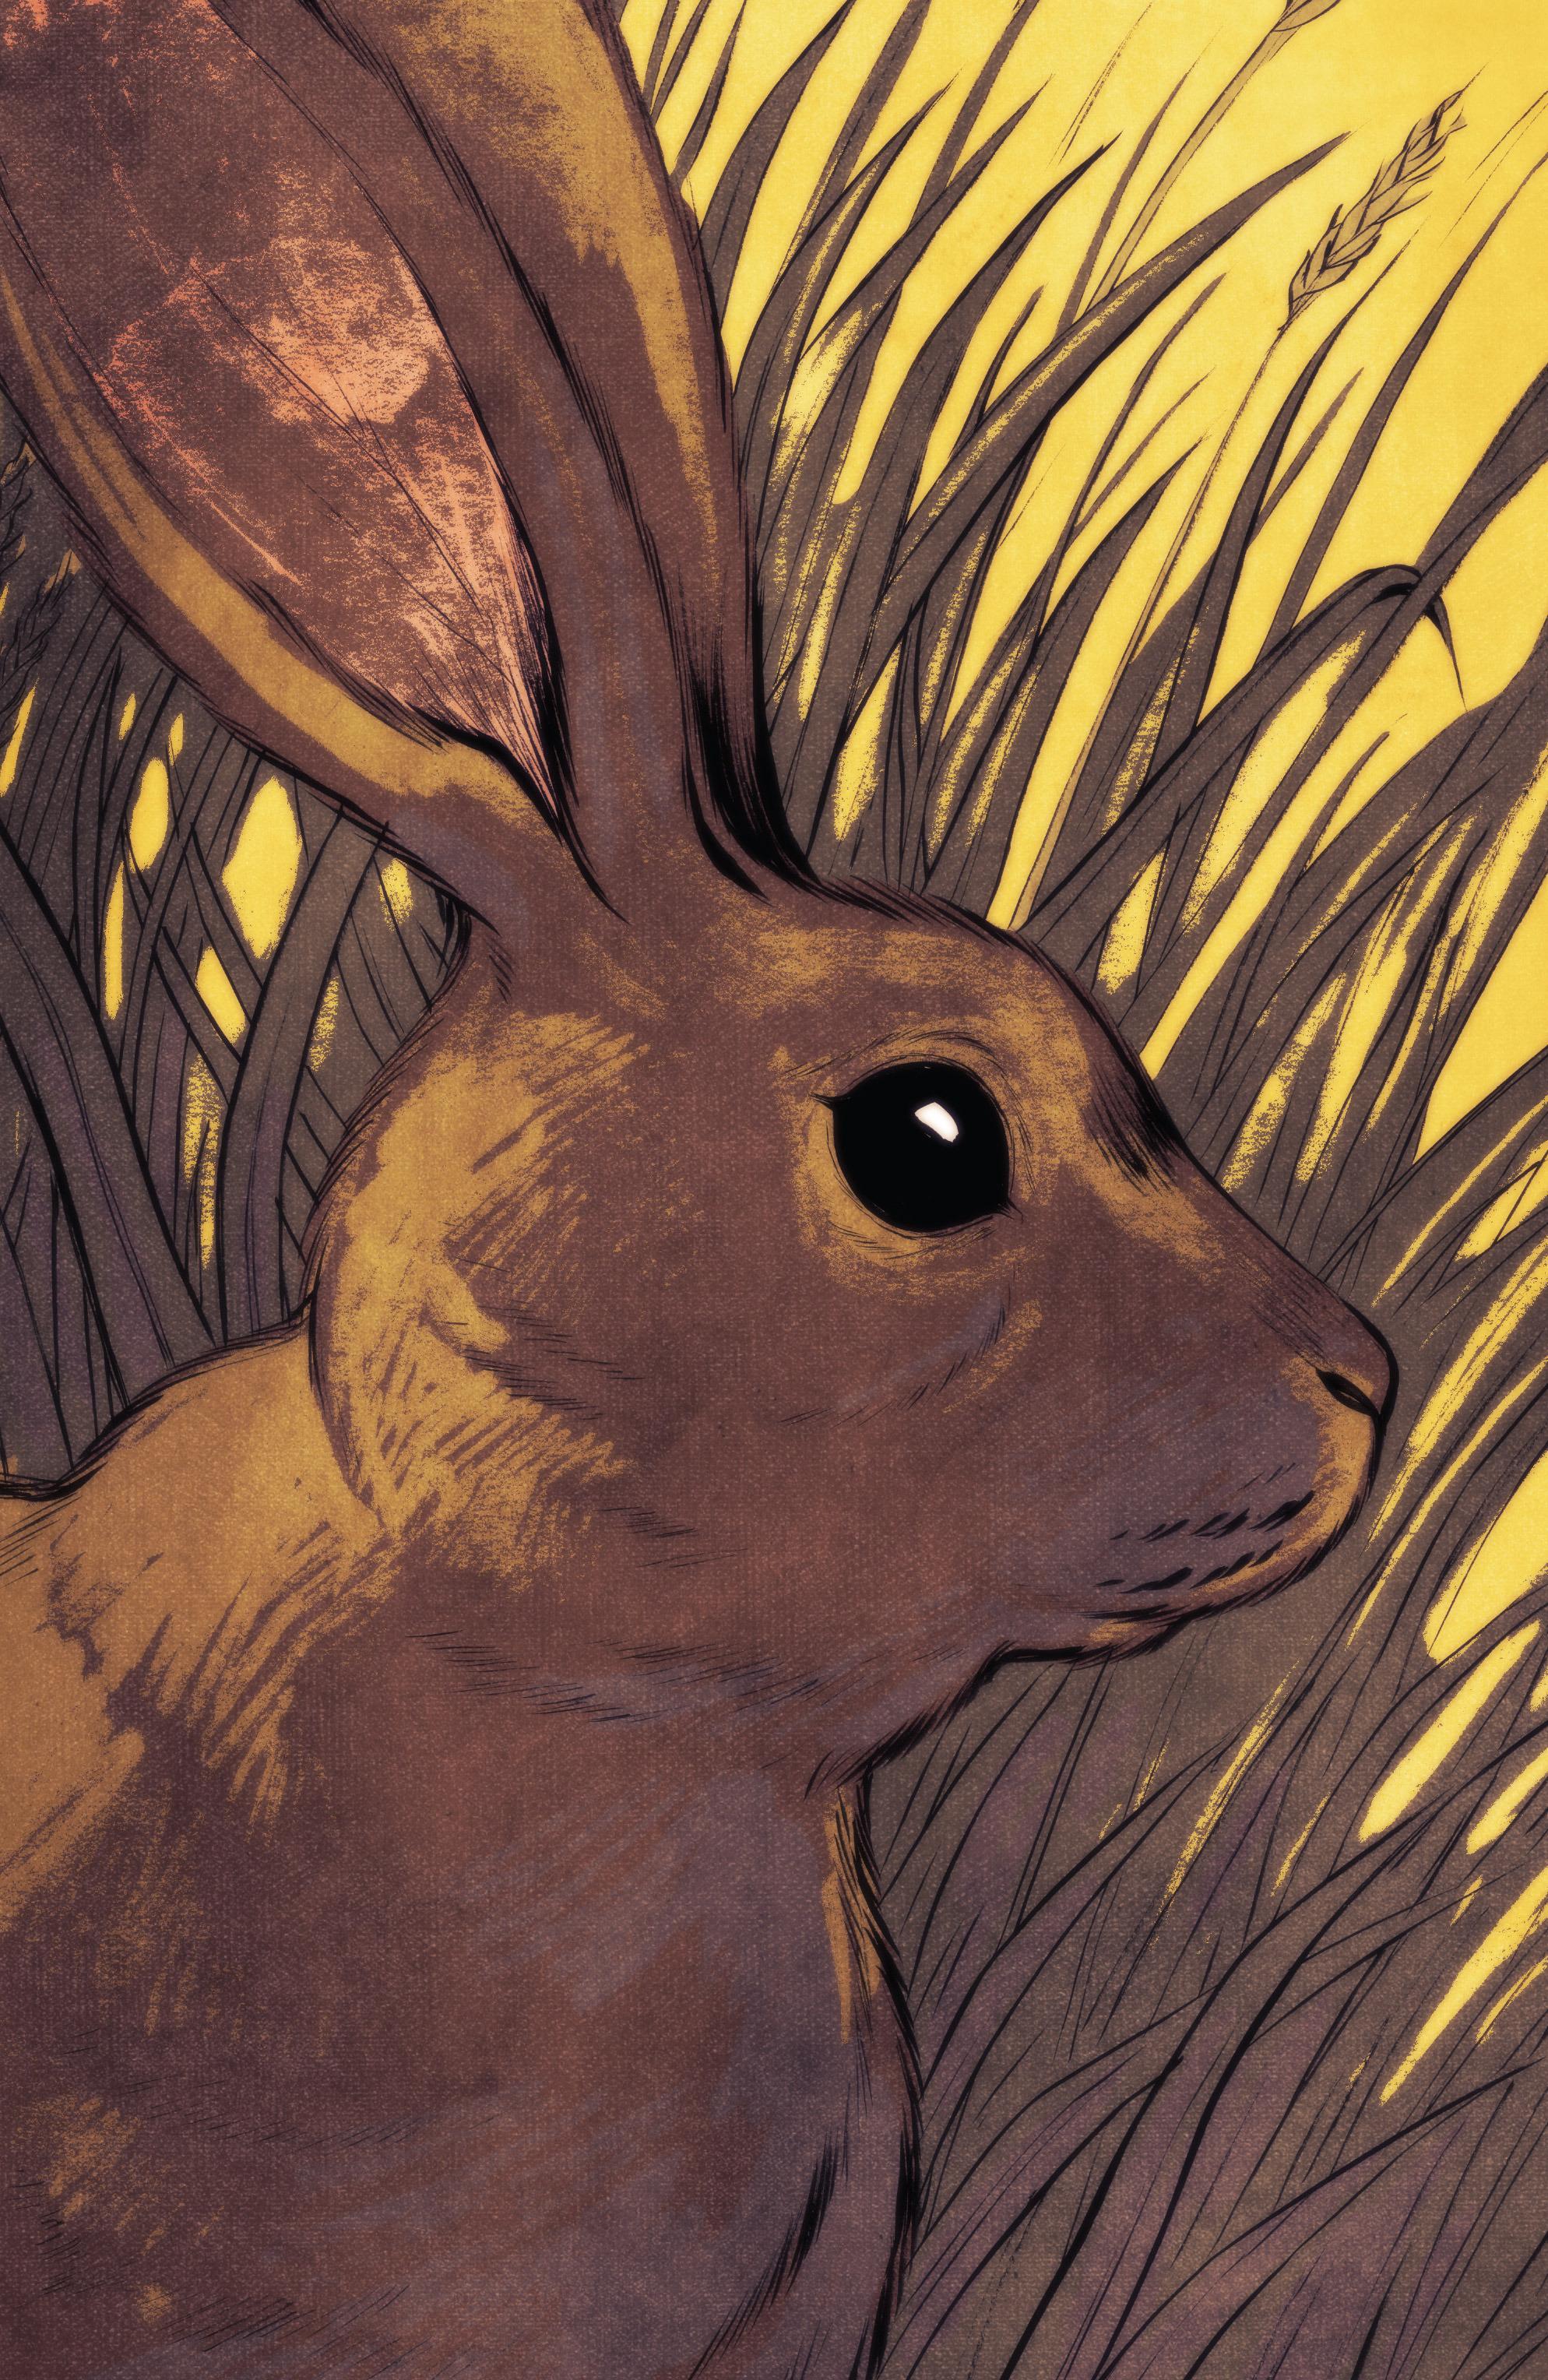 Read online Shutter comic -  Issue #24 - 18